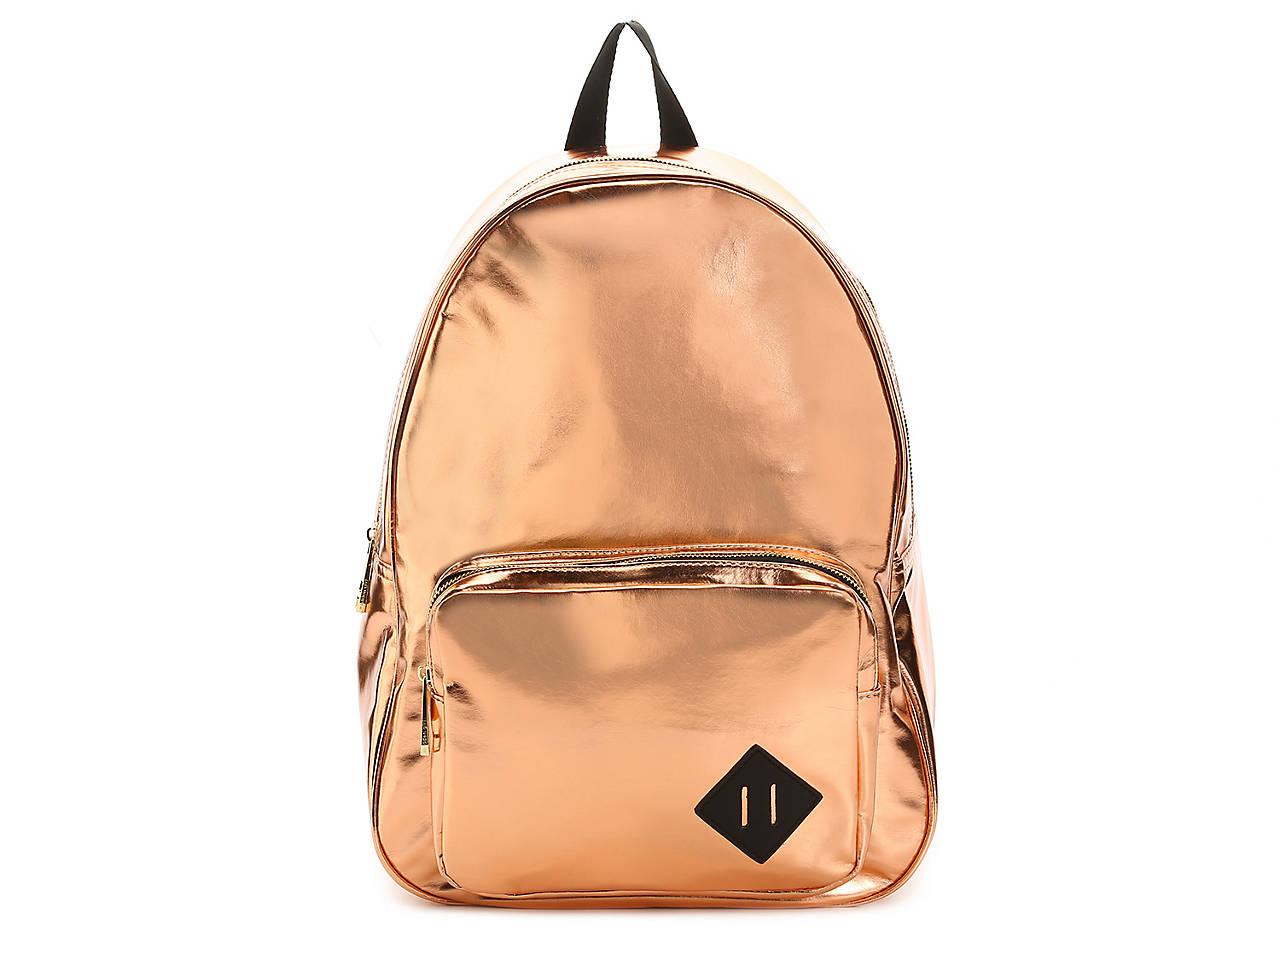 6e0190ab0fa Madden Girl Gorbit Backpack Women's Handbags & Accessories | DSW